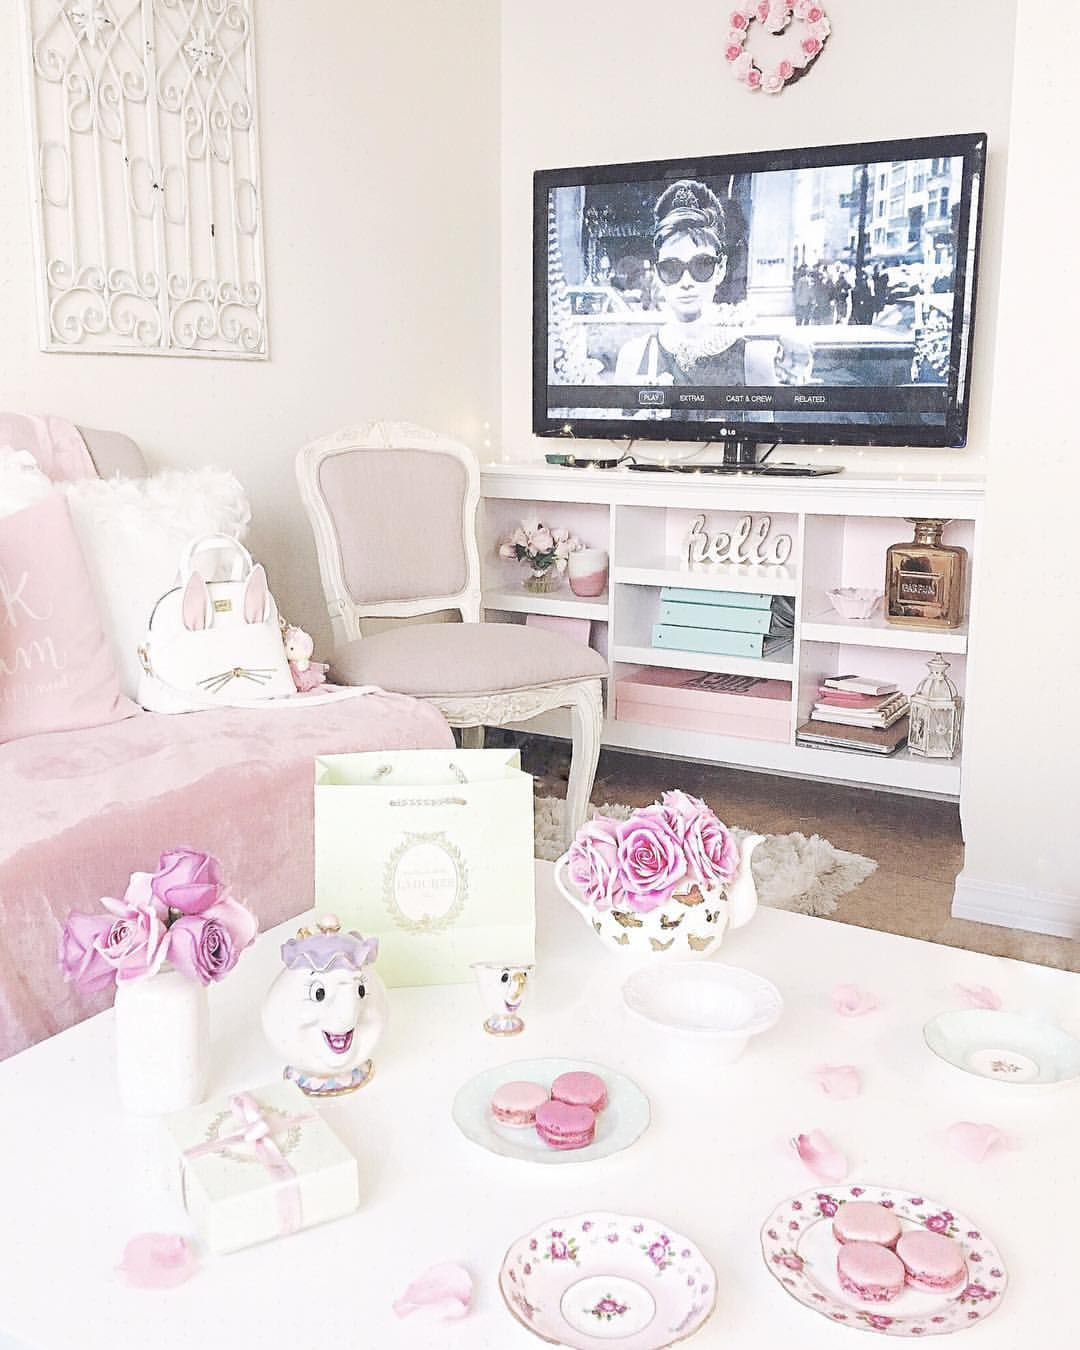 Jadore Lexie Couture, Audrey Hepburn, Feminine Home Decor, Feminine Blog, Feminine  Home